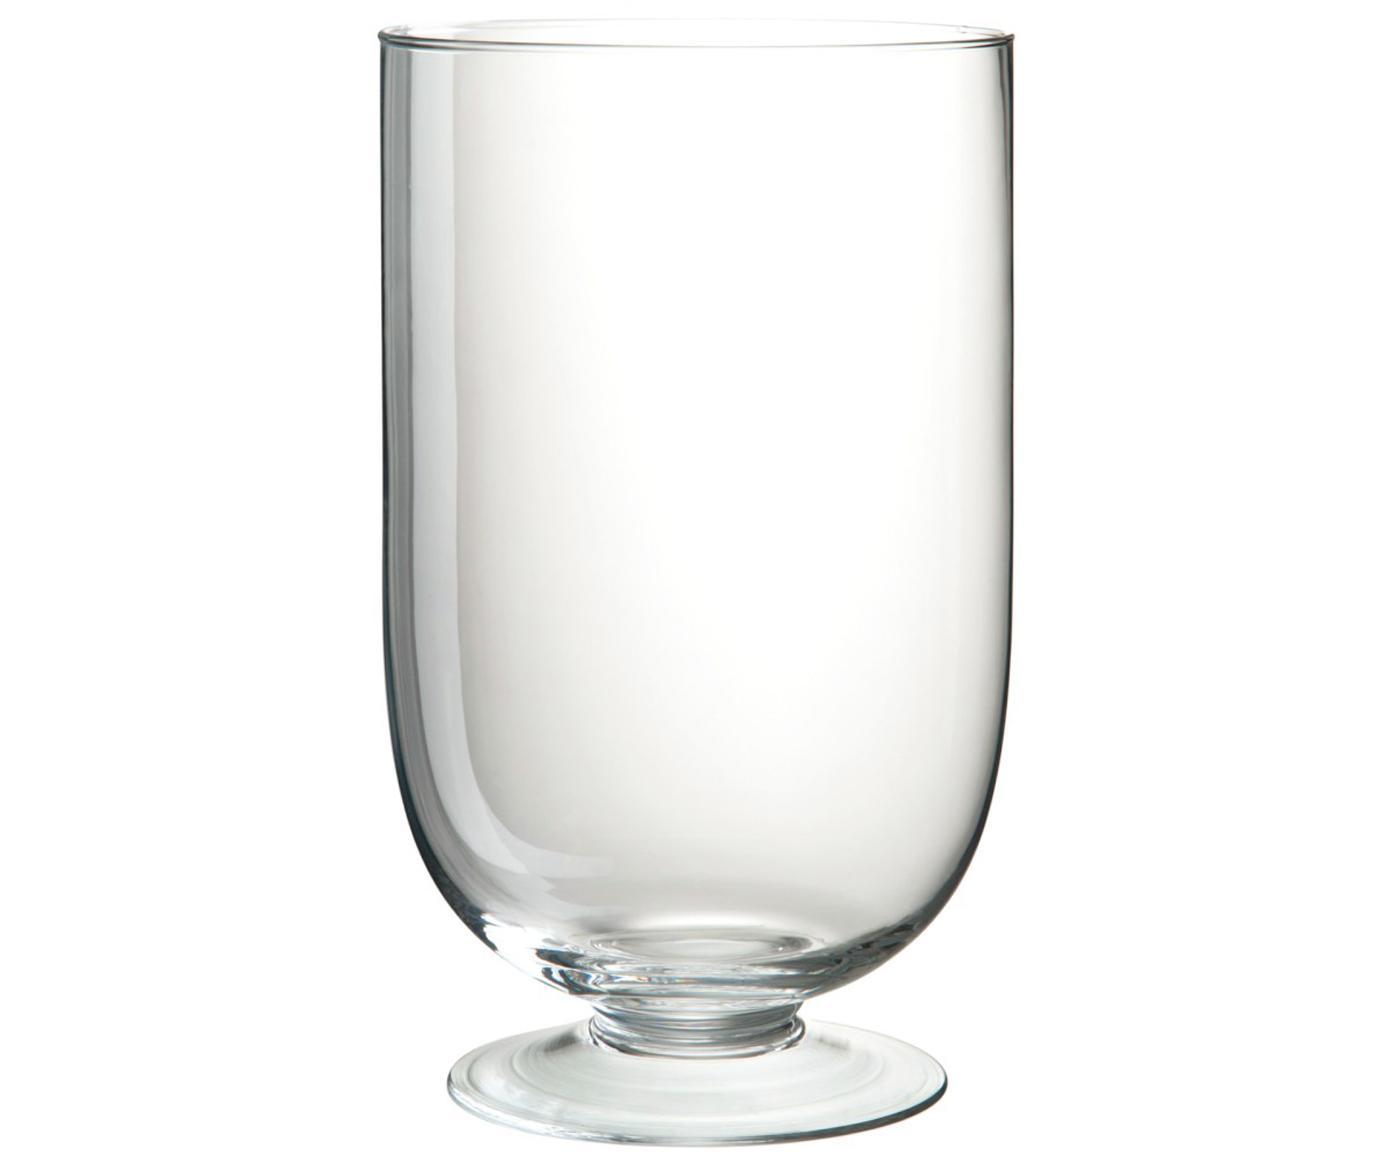 Vaas Clery, Glas, Transparant, Ø 15 x H 24 cm